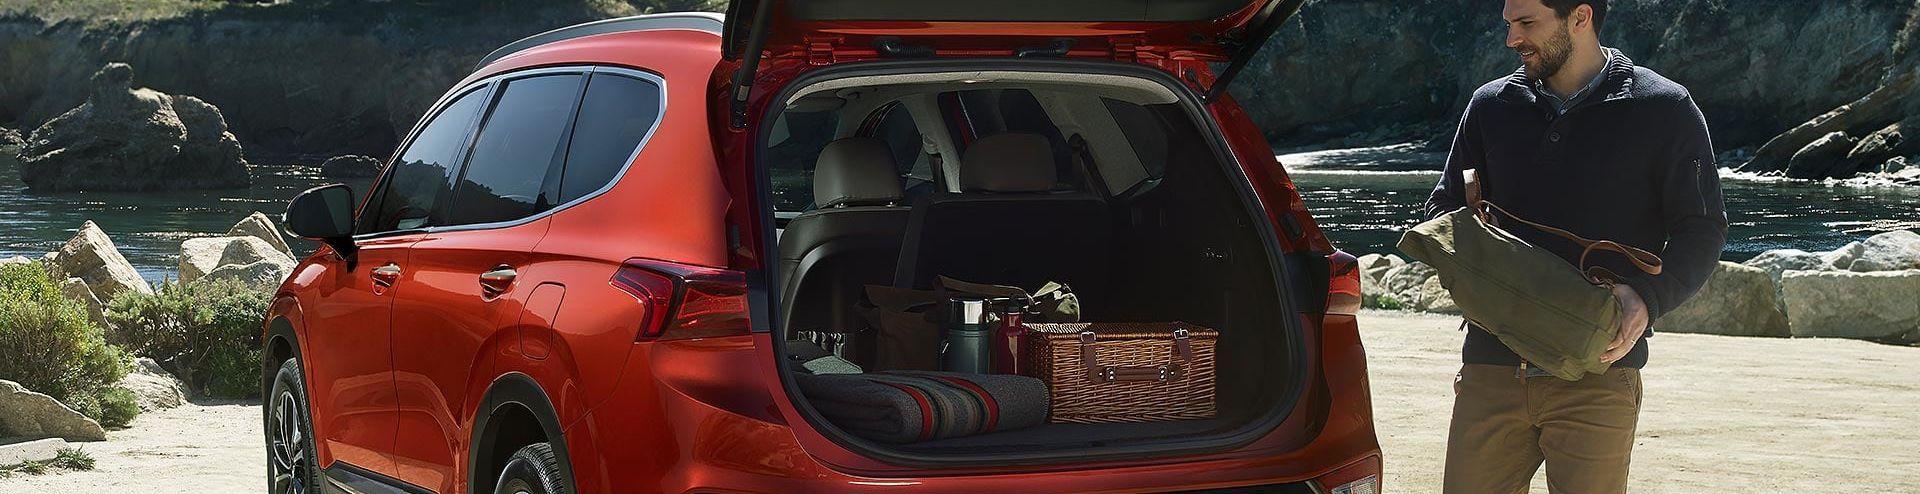 2019 Hyundai Santa Fe Cargo Space